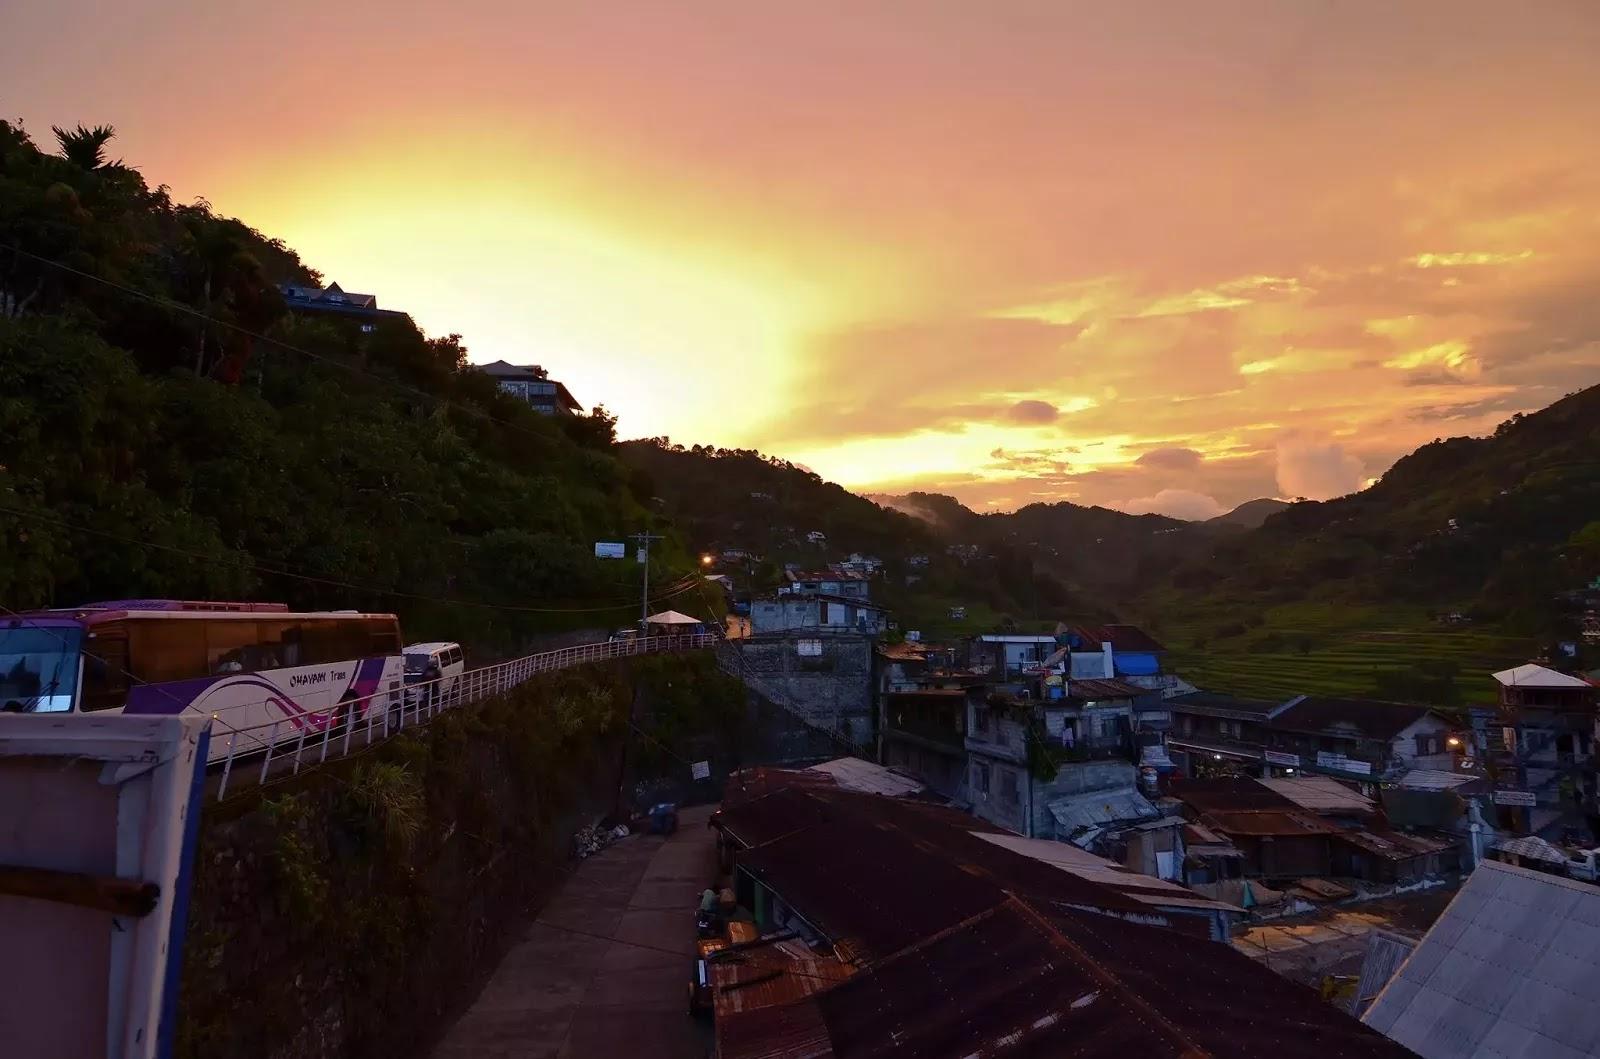 Poblacion Sunset Ifugao Cordillera Administrative Region Philippines